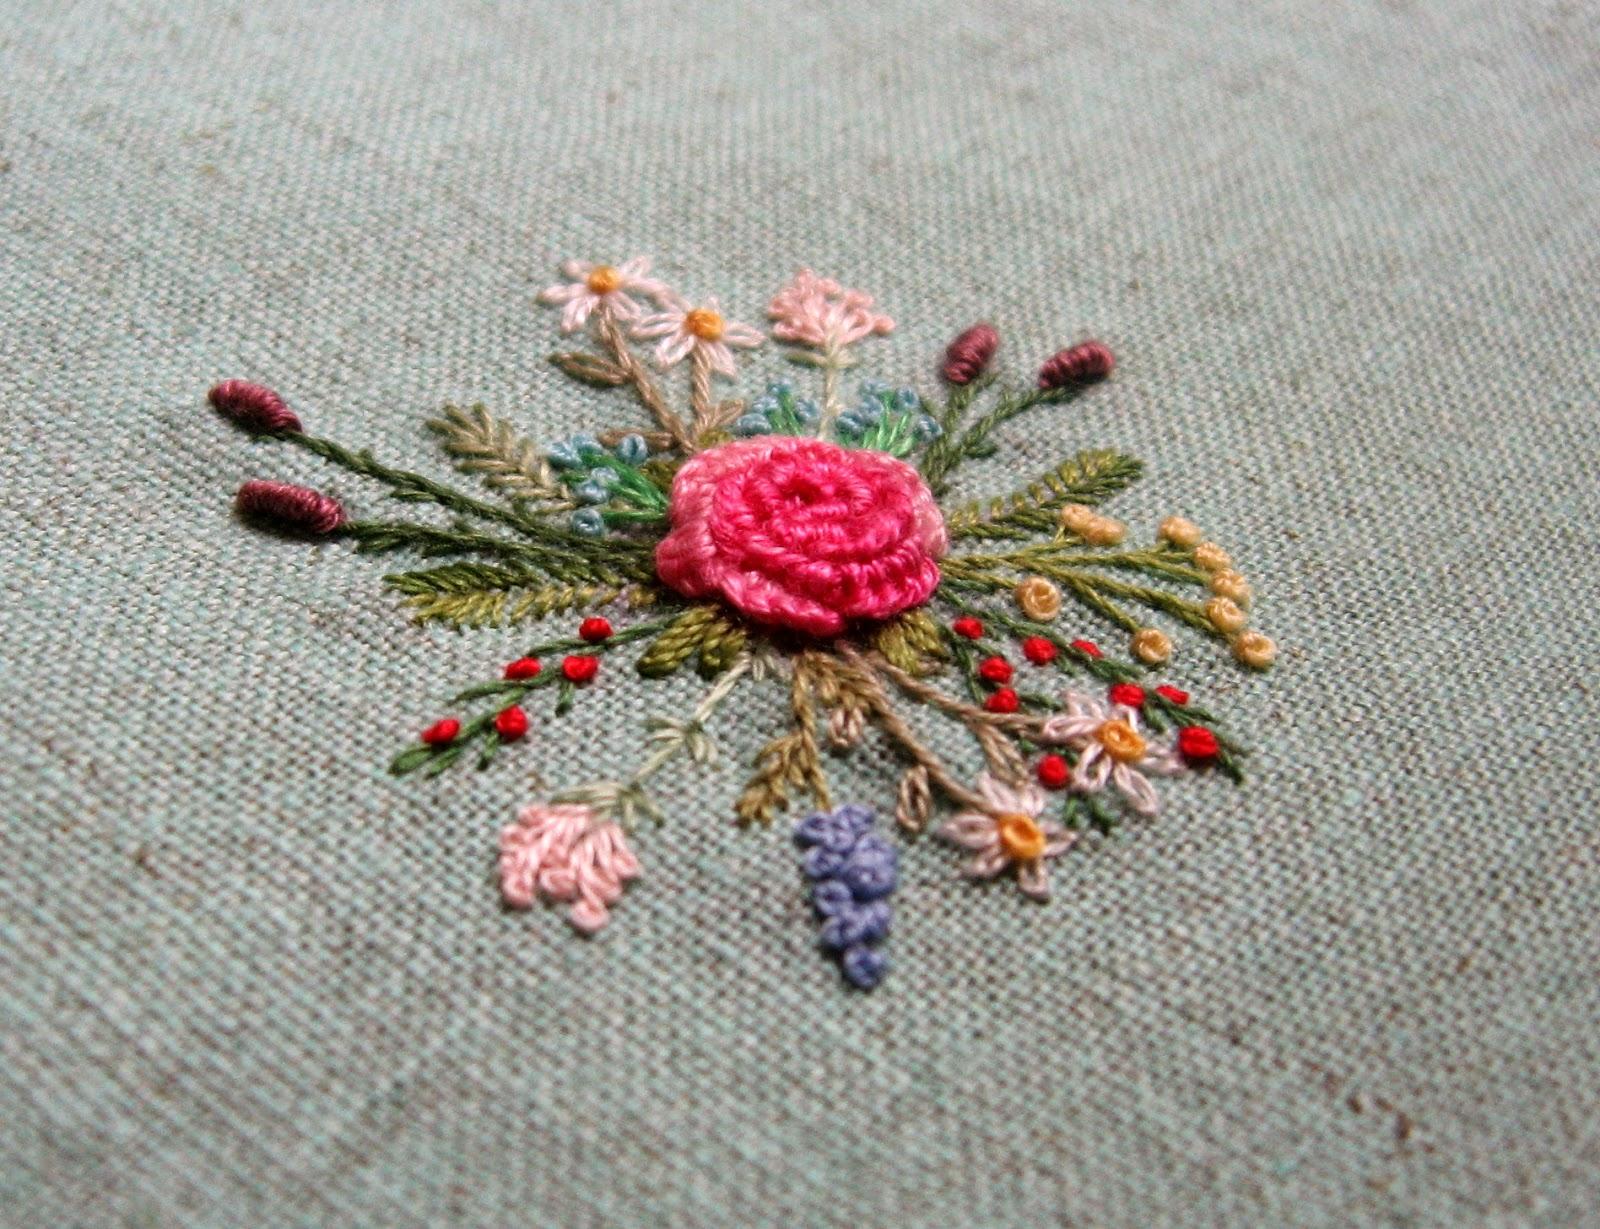 Вышивки шов рококо фото